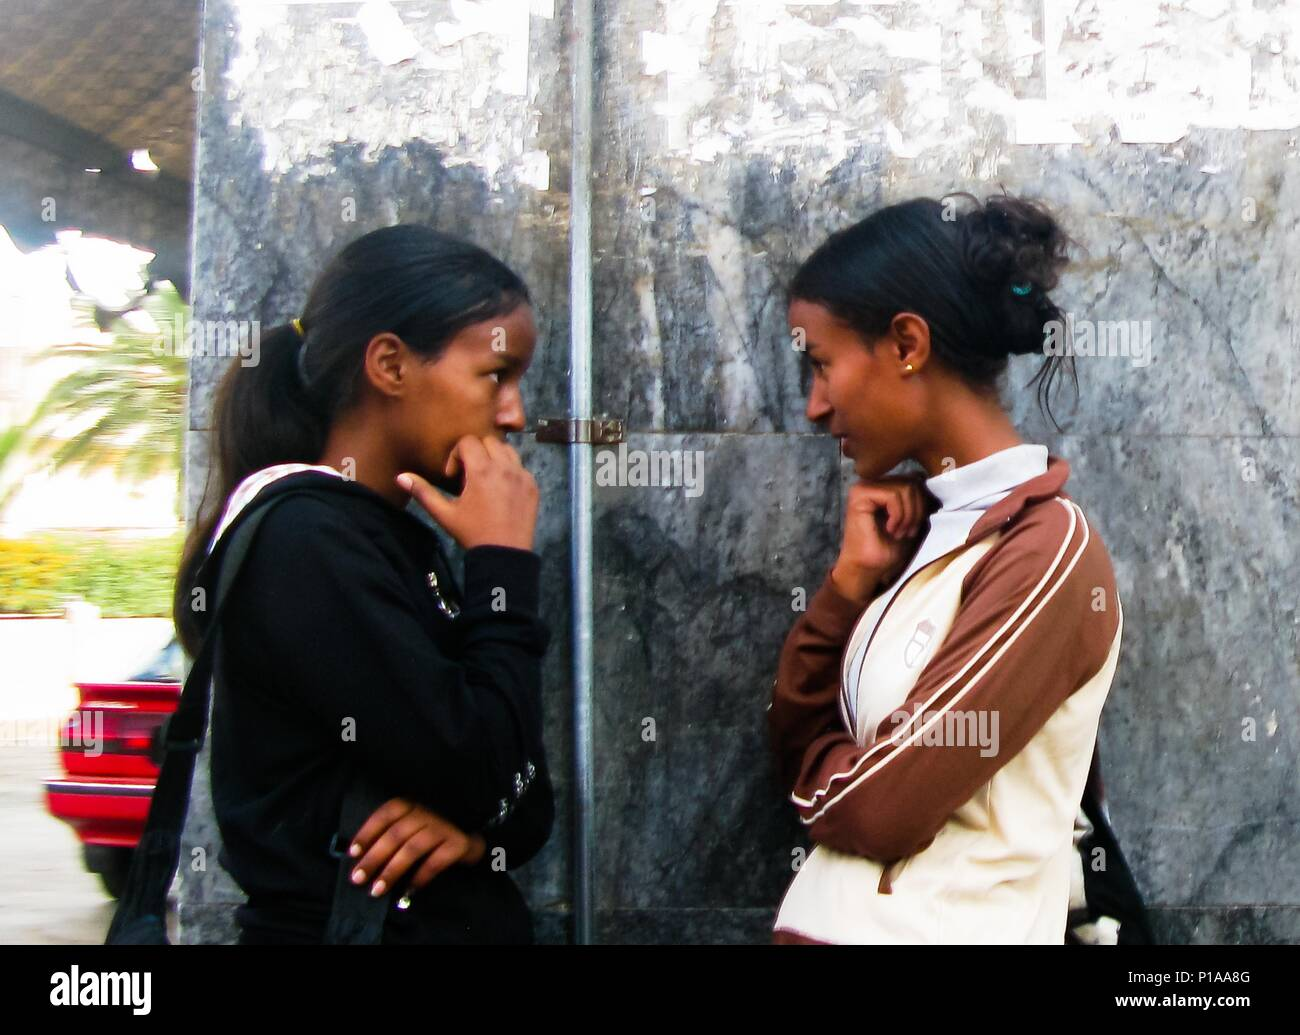 eritrean woman stock photos & eritrean woman stock images